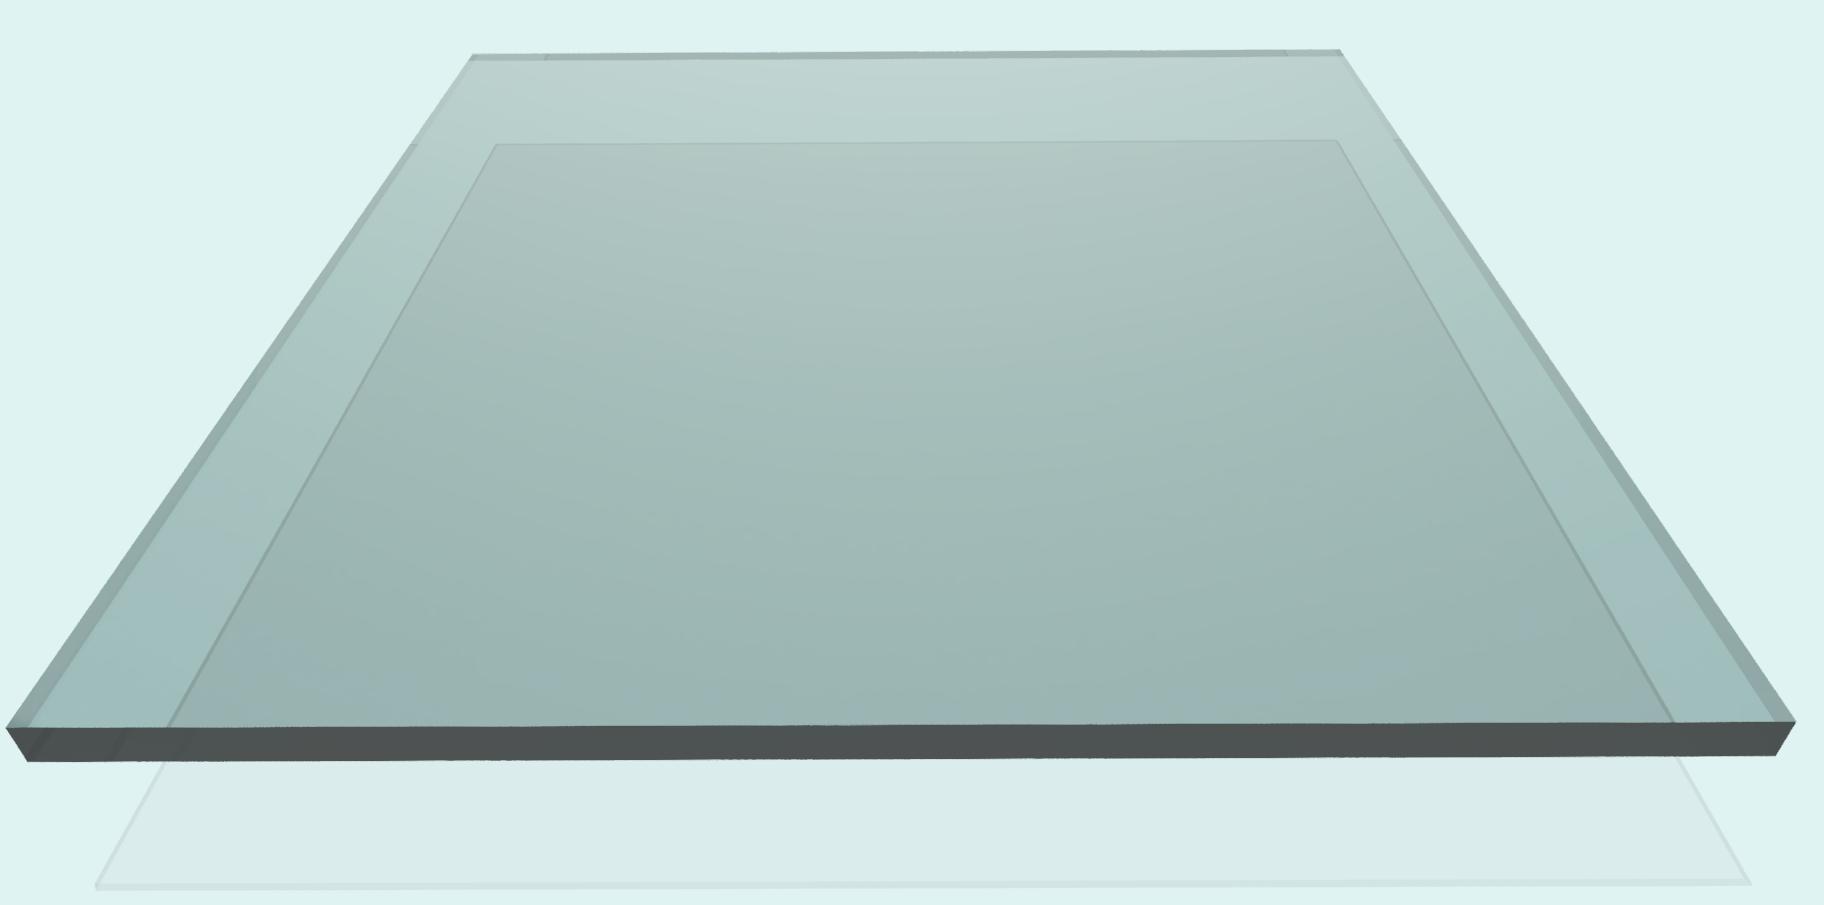 Polycarbonat 6mm, klar, antistatisch